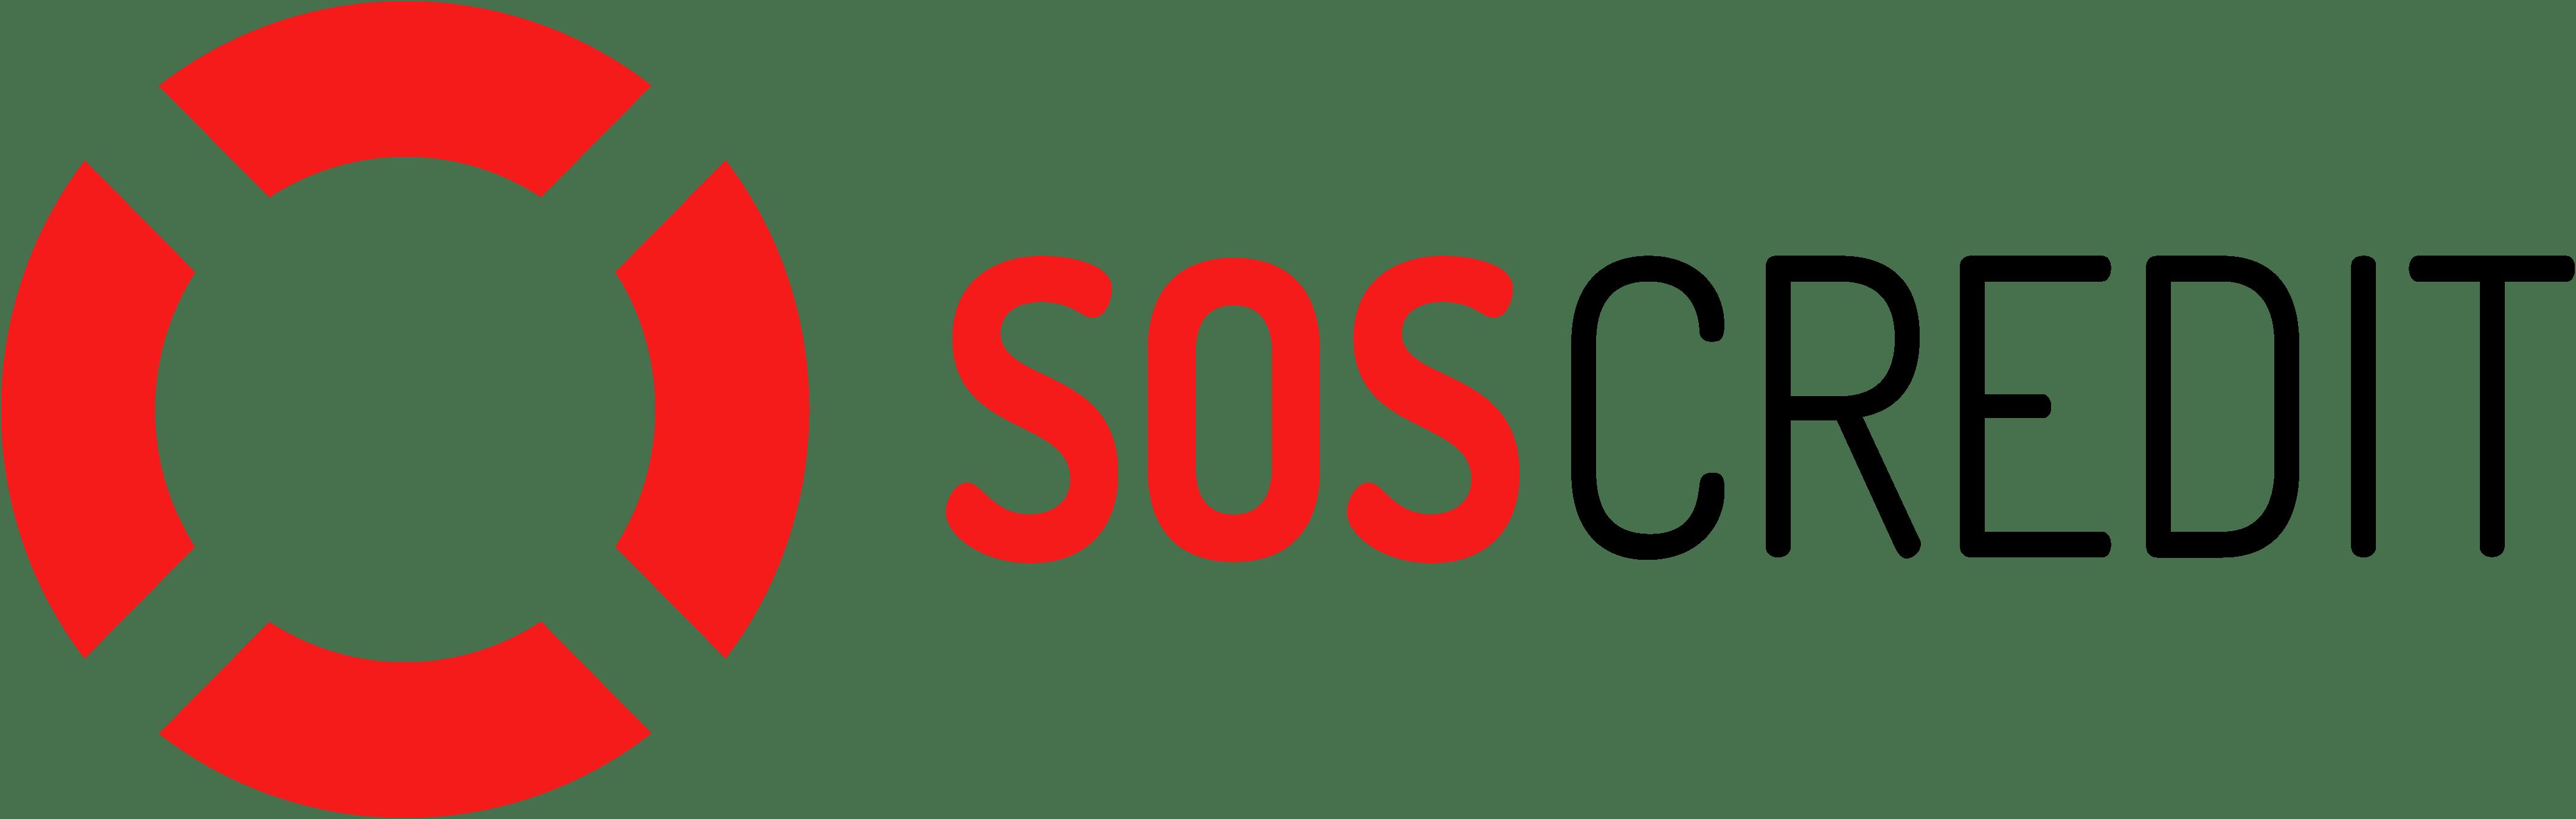 Soscredit.ua - візьміть кредит в Soscredit.ua